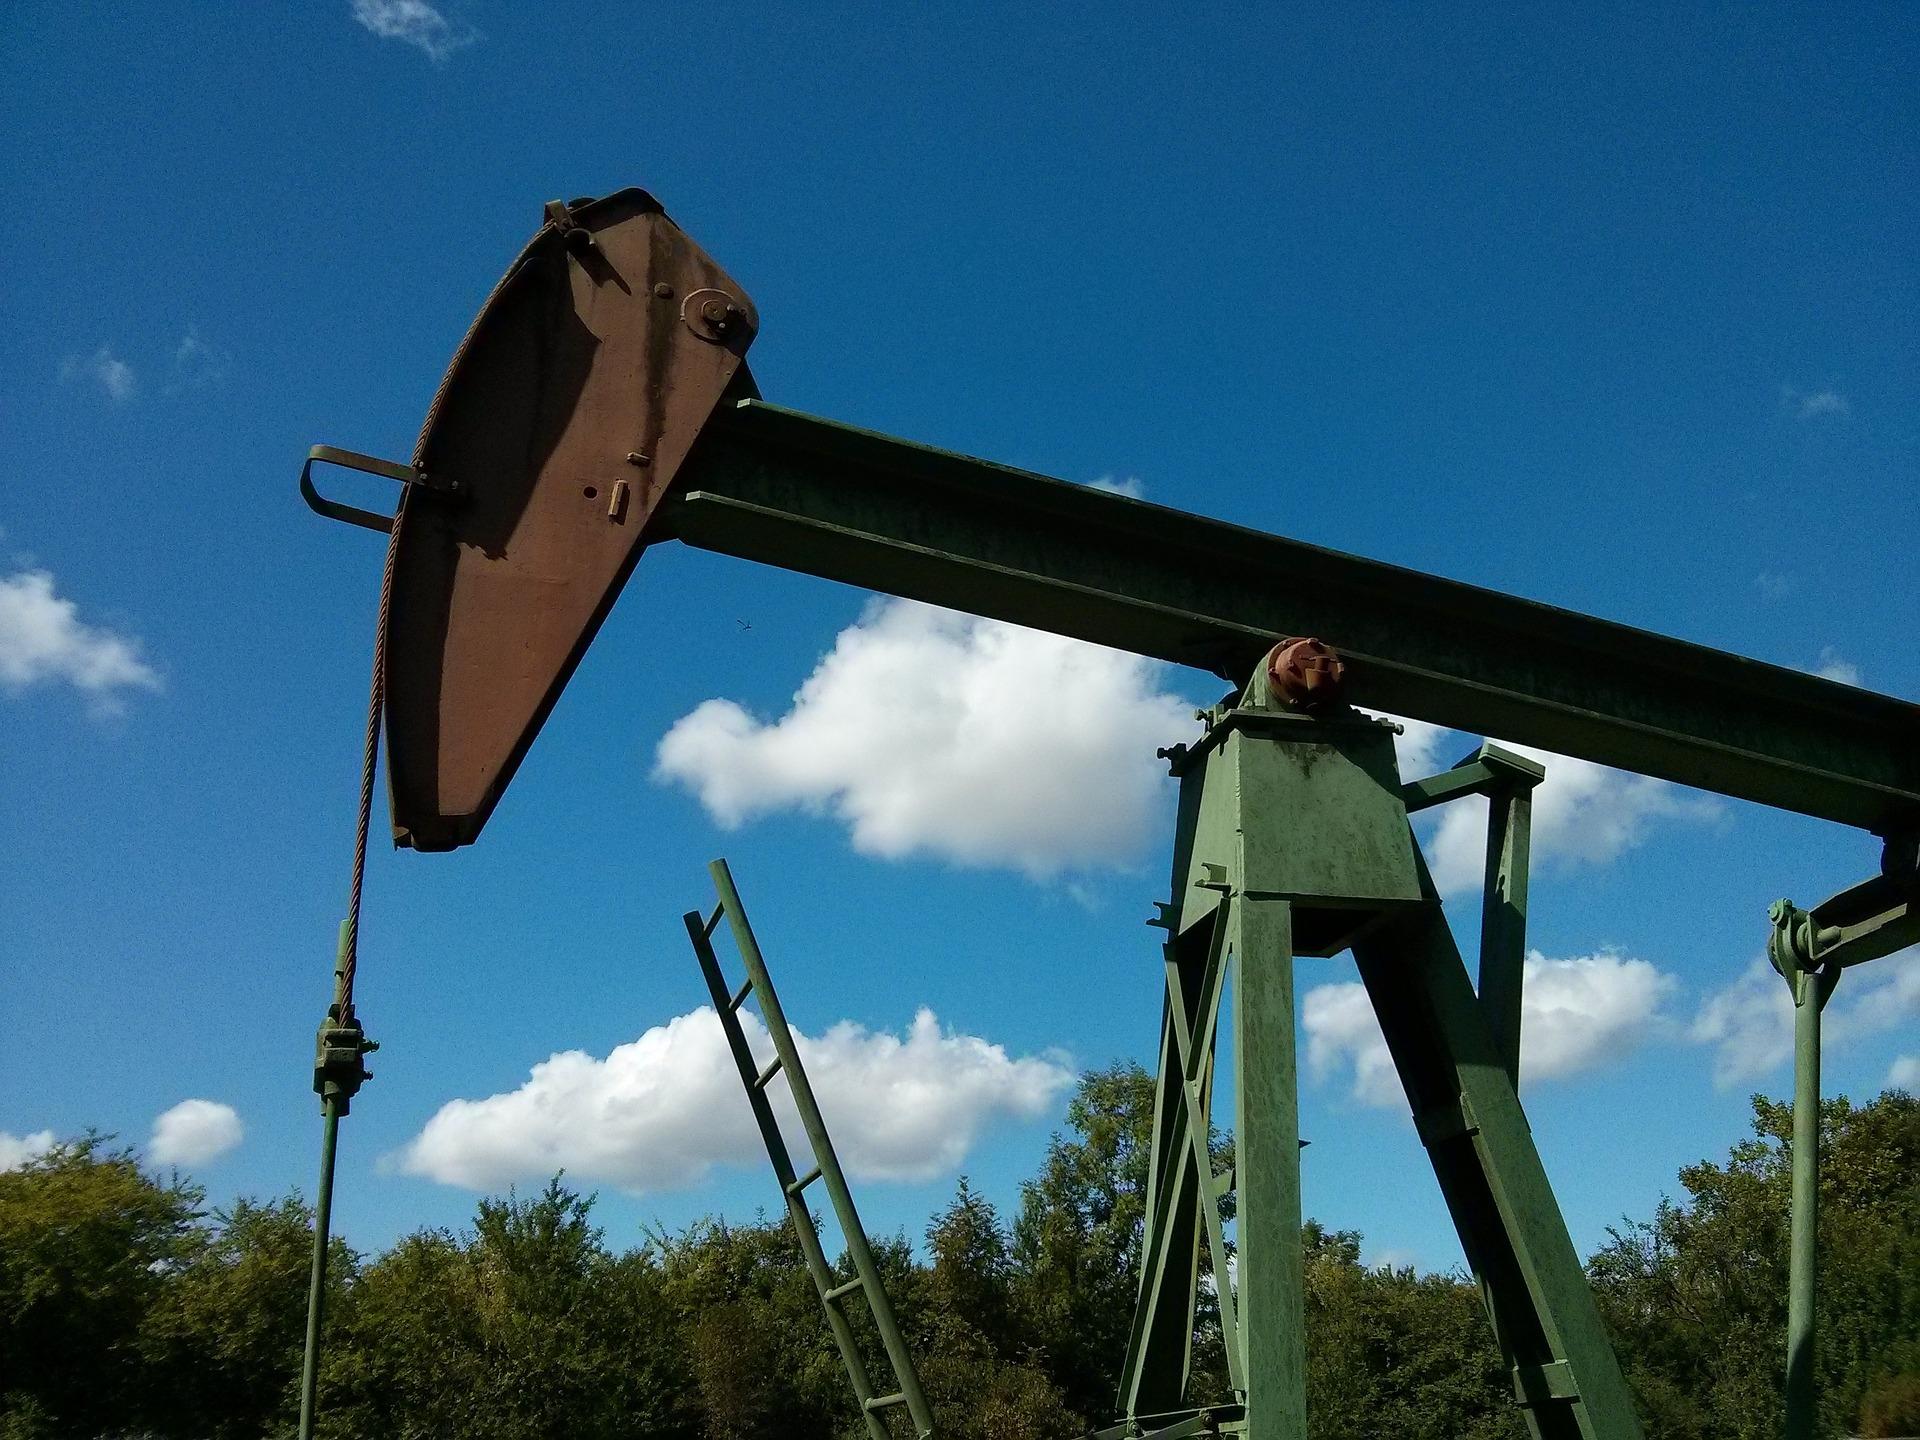 Green Judgement, anstatt Green Deal! Bezirksgericht in Den Haag verurteilt Shell zur stärkeren CO2-Reduzierung!